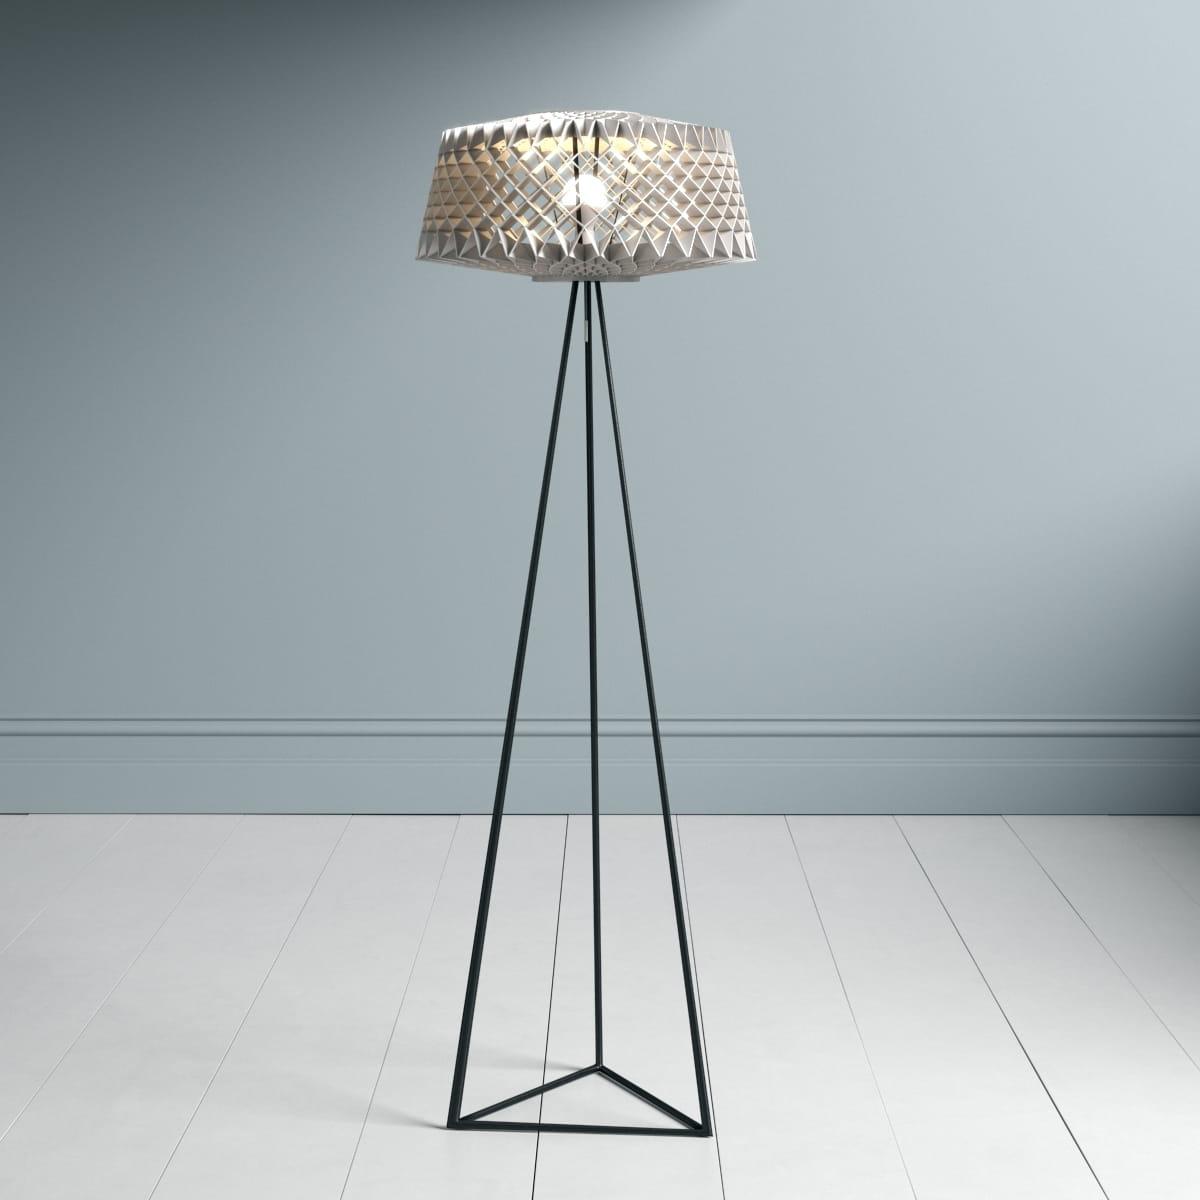 lamp 41 AM247